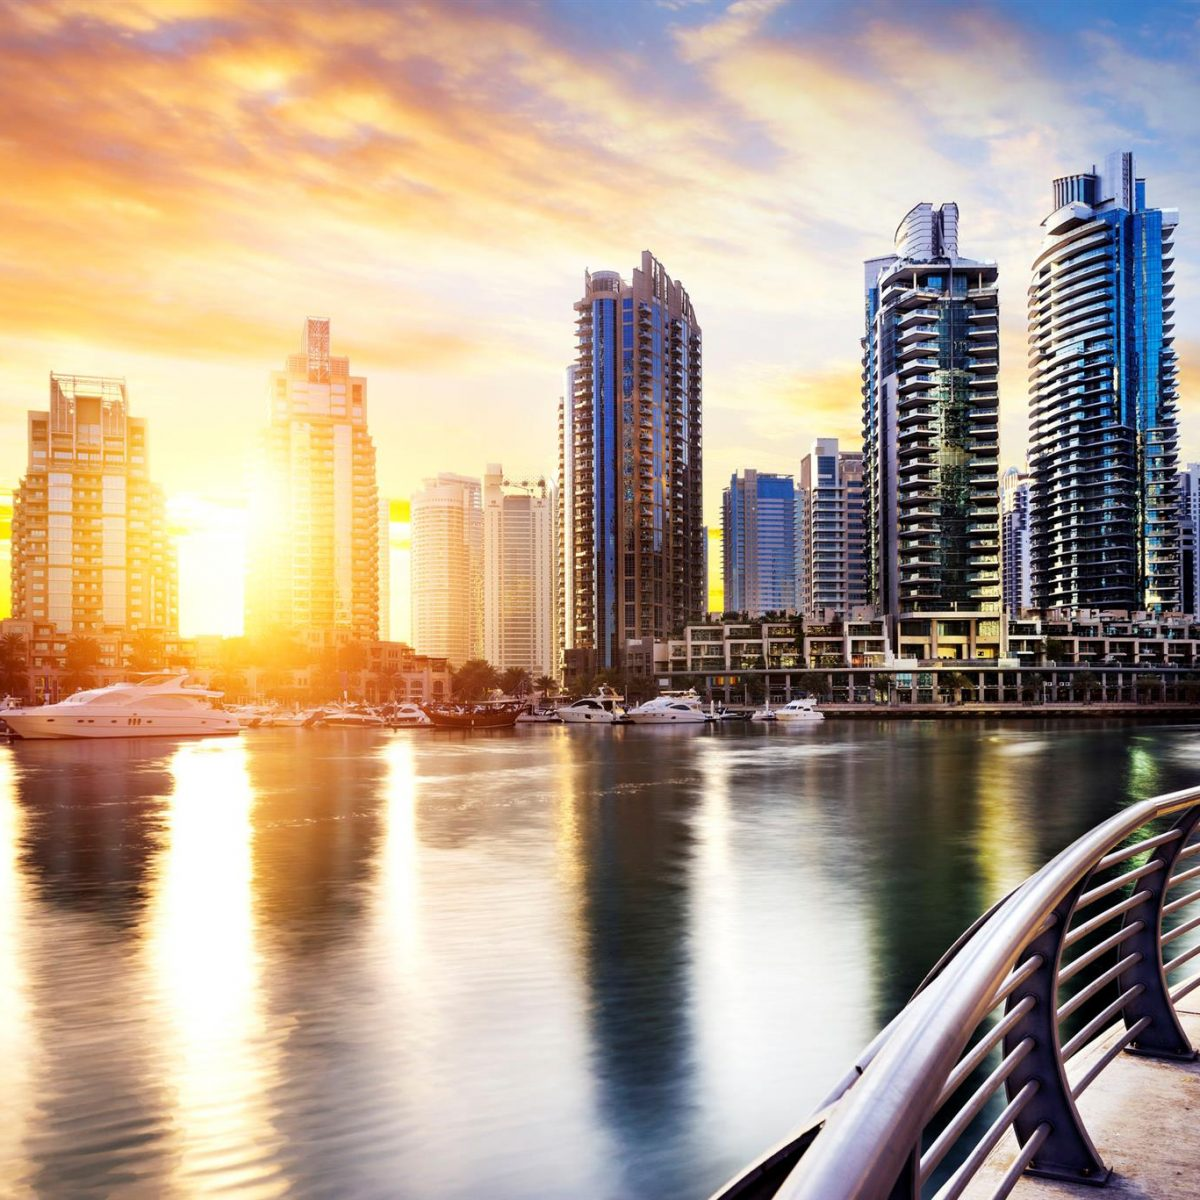 Dubai skyscrapers gear up Self-climbing robots to install elevators